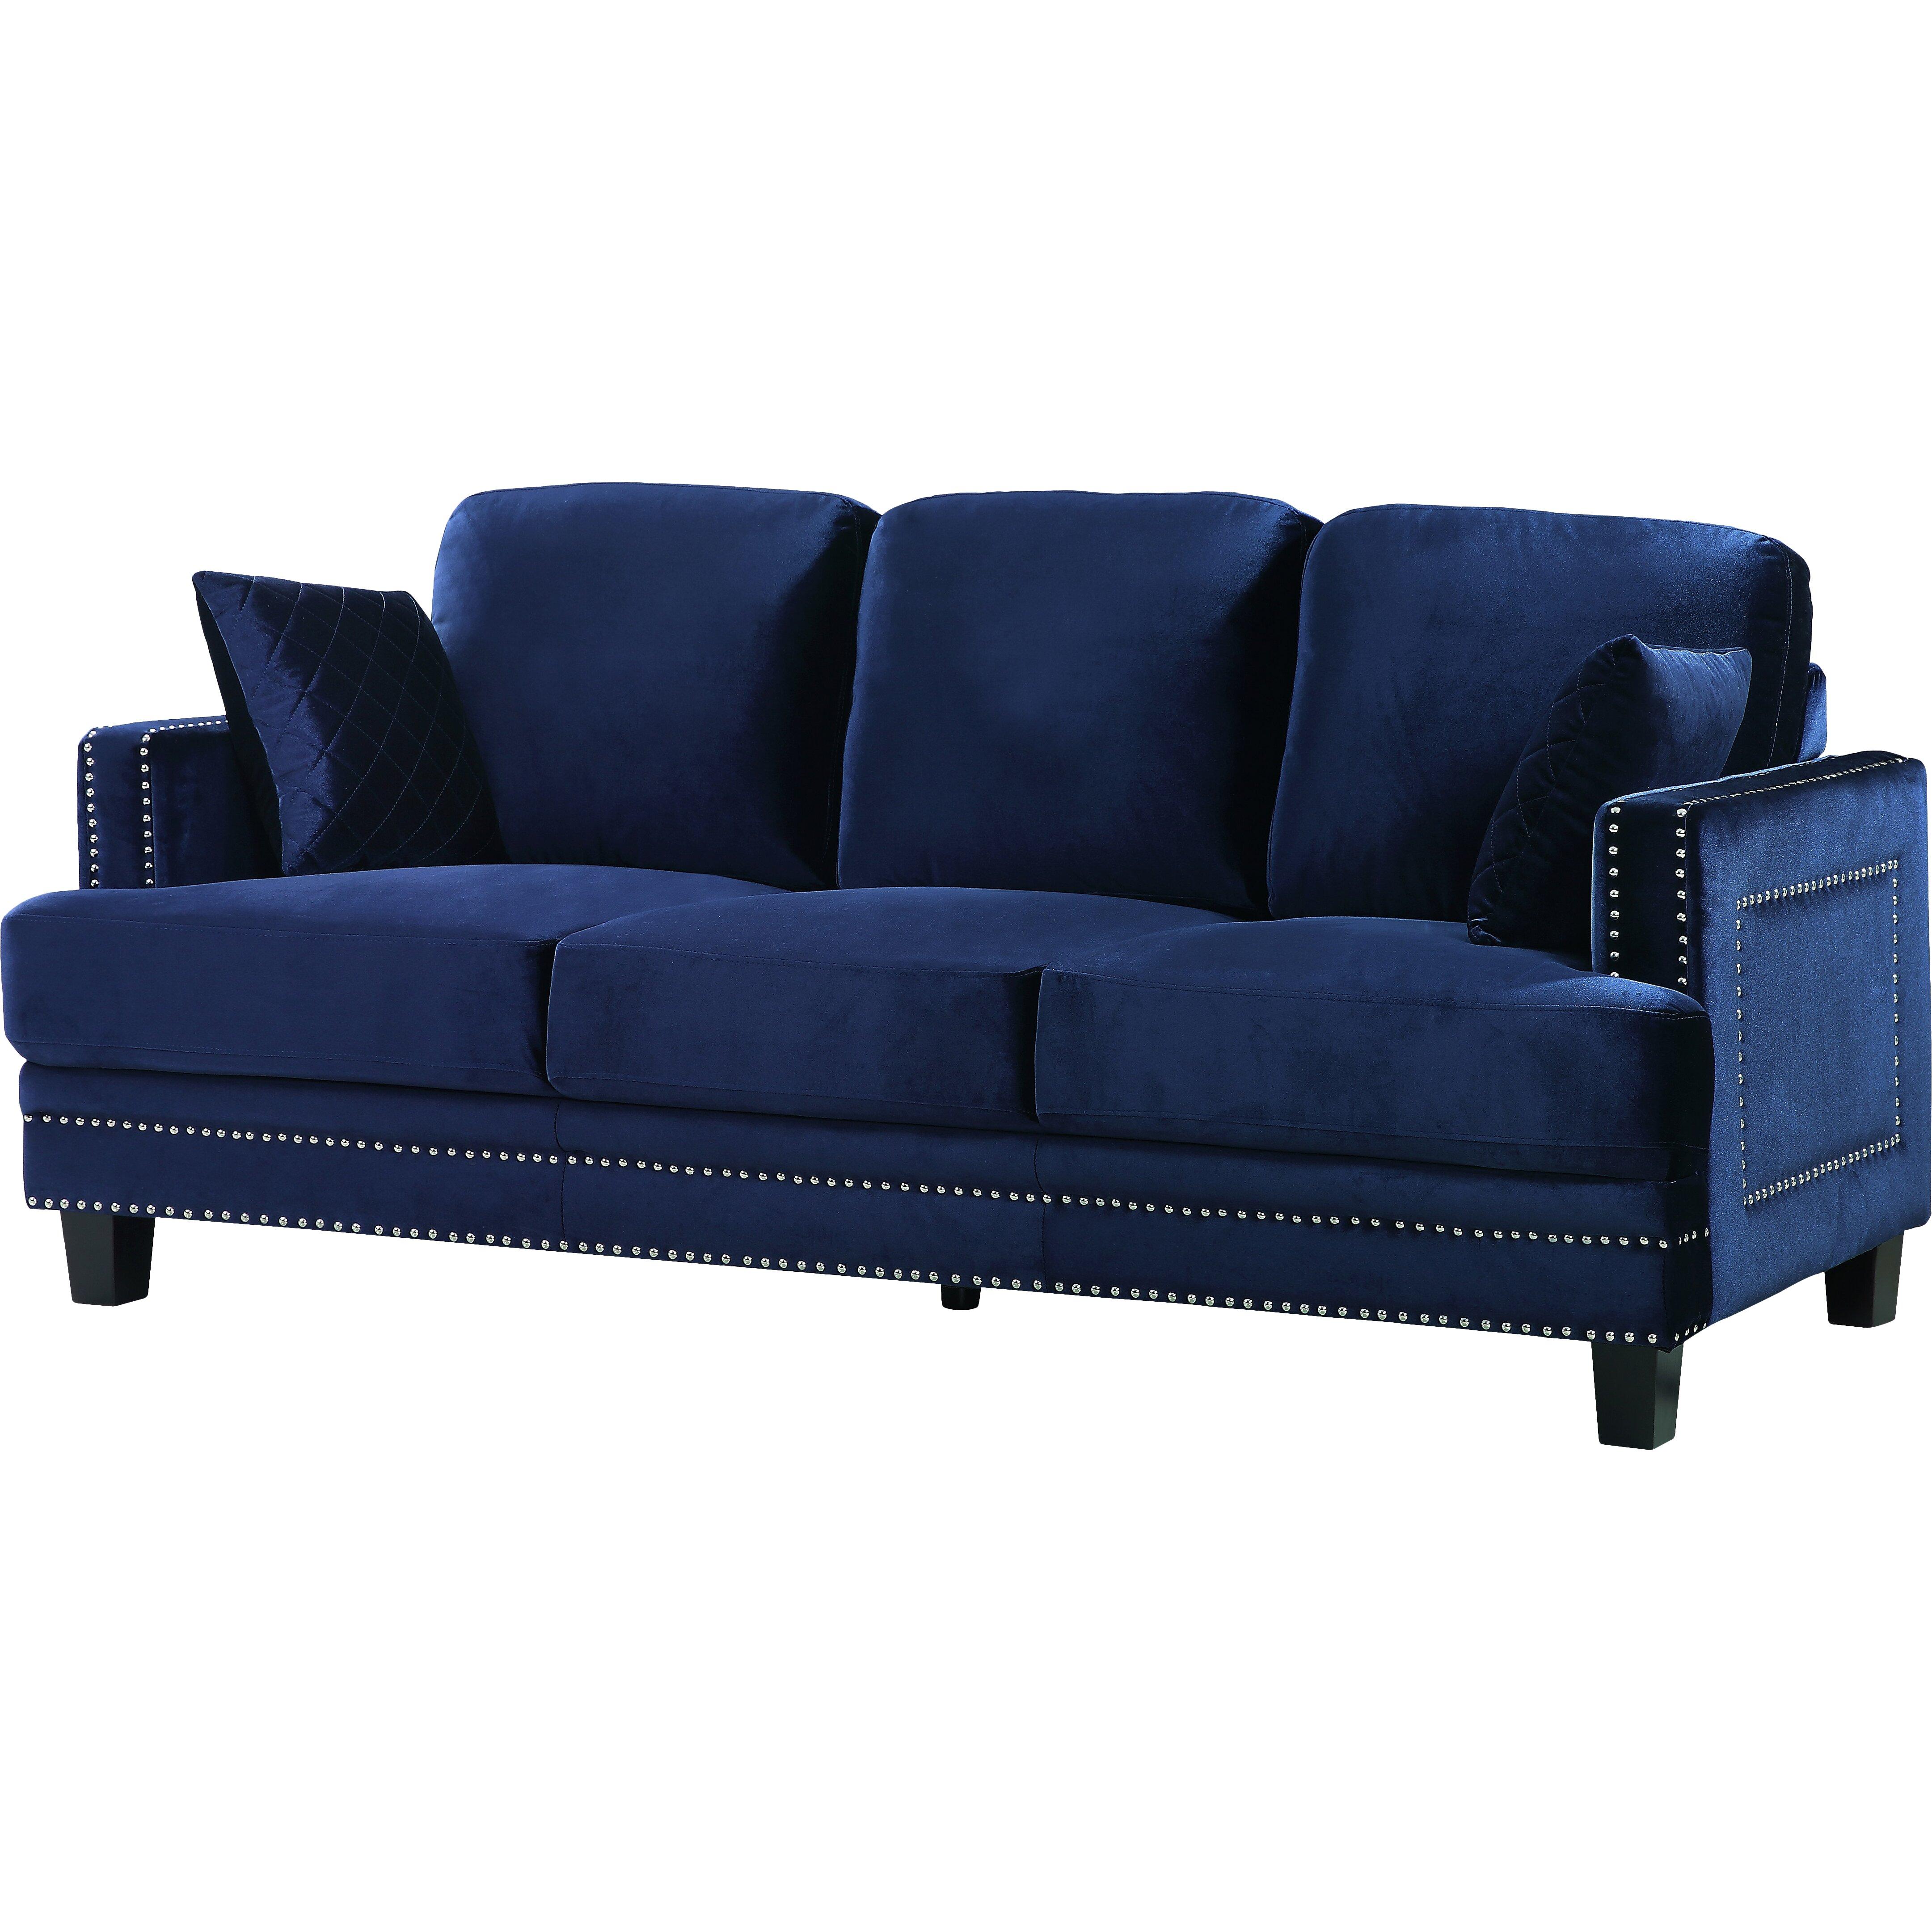 Meridian furniture usa ferrara nailhead sofa reviews for Furniture usa